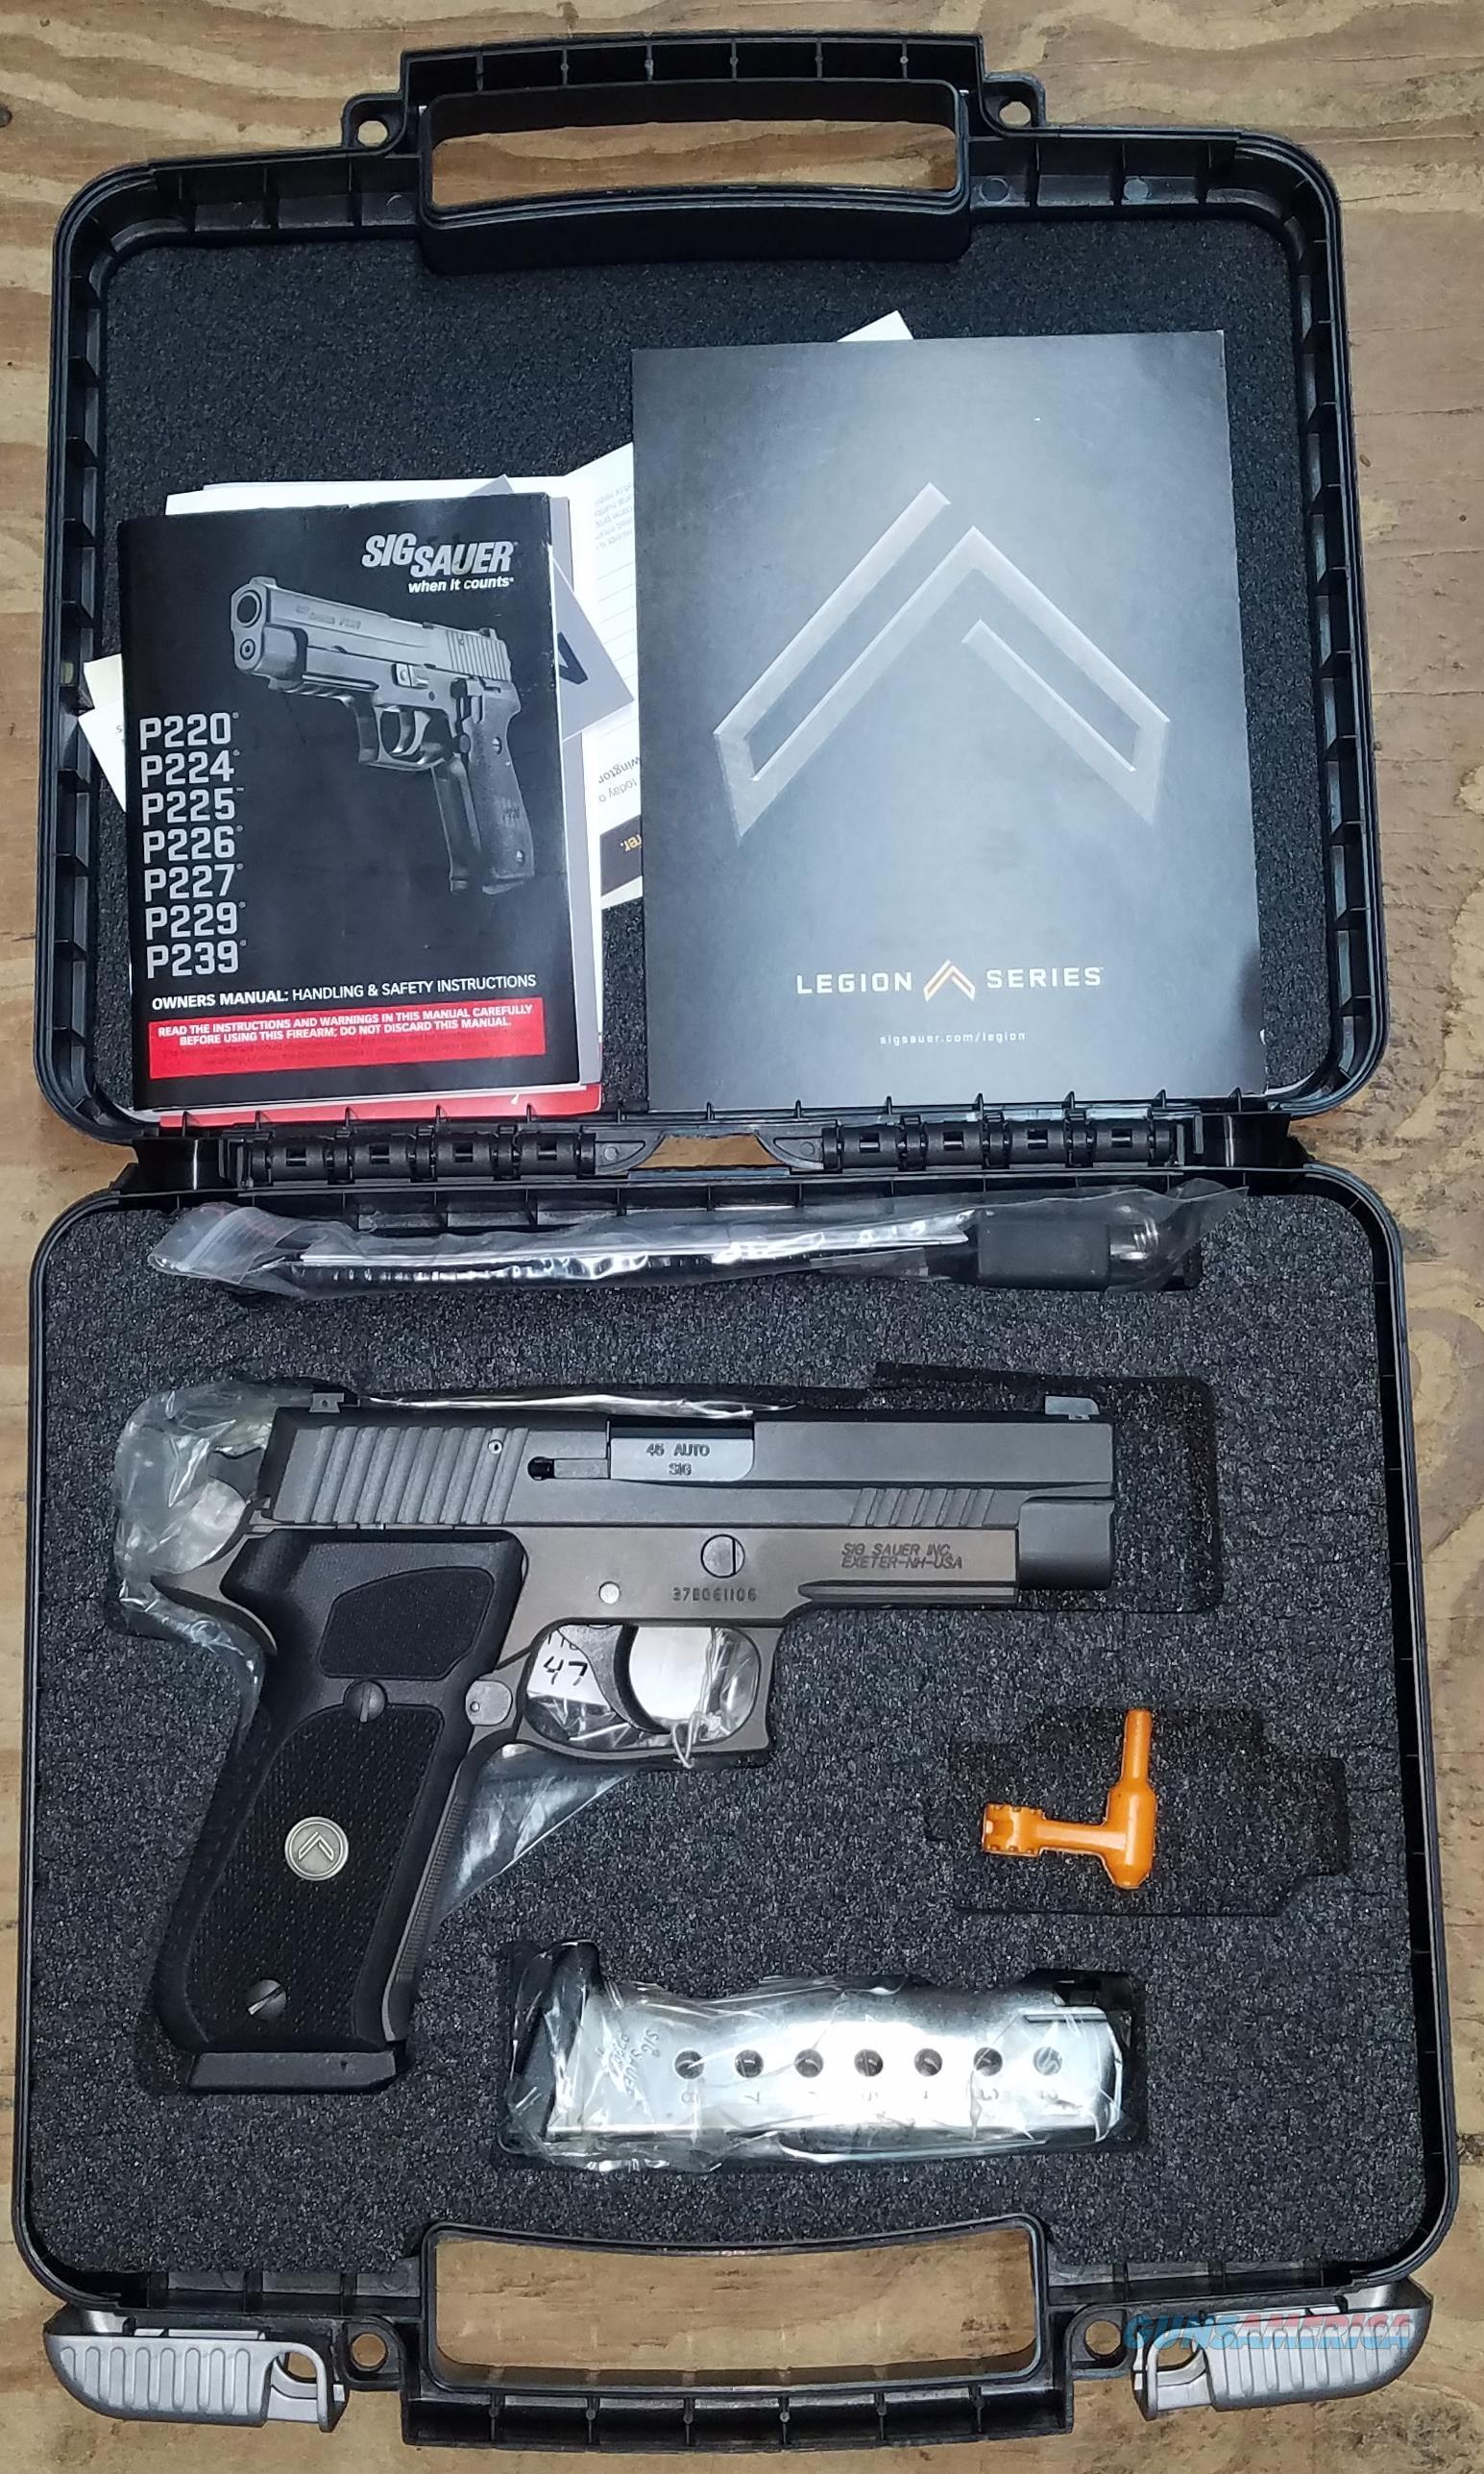 SIG Sauer P220 220R-45-LEGION Legion Full Size 45 ACP  Guns > Pistols > Sig - Sauer/Sigarms Pistols > P220